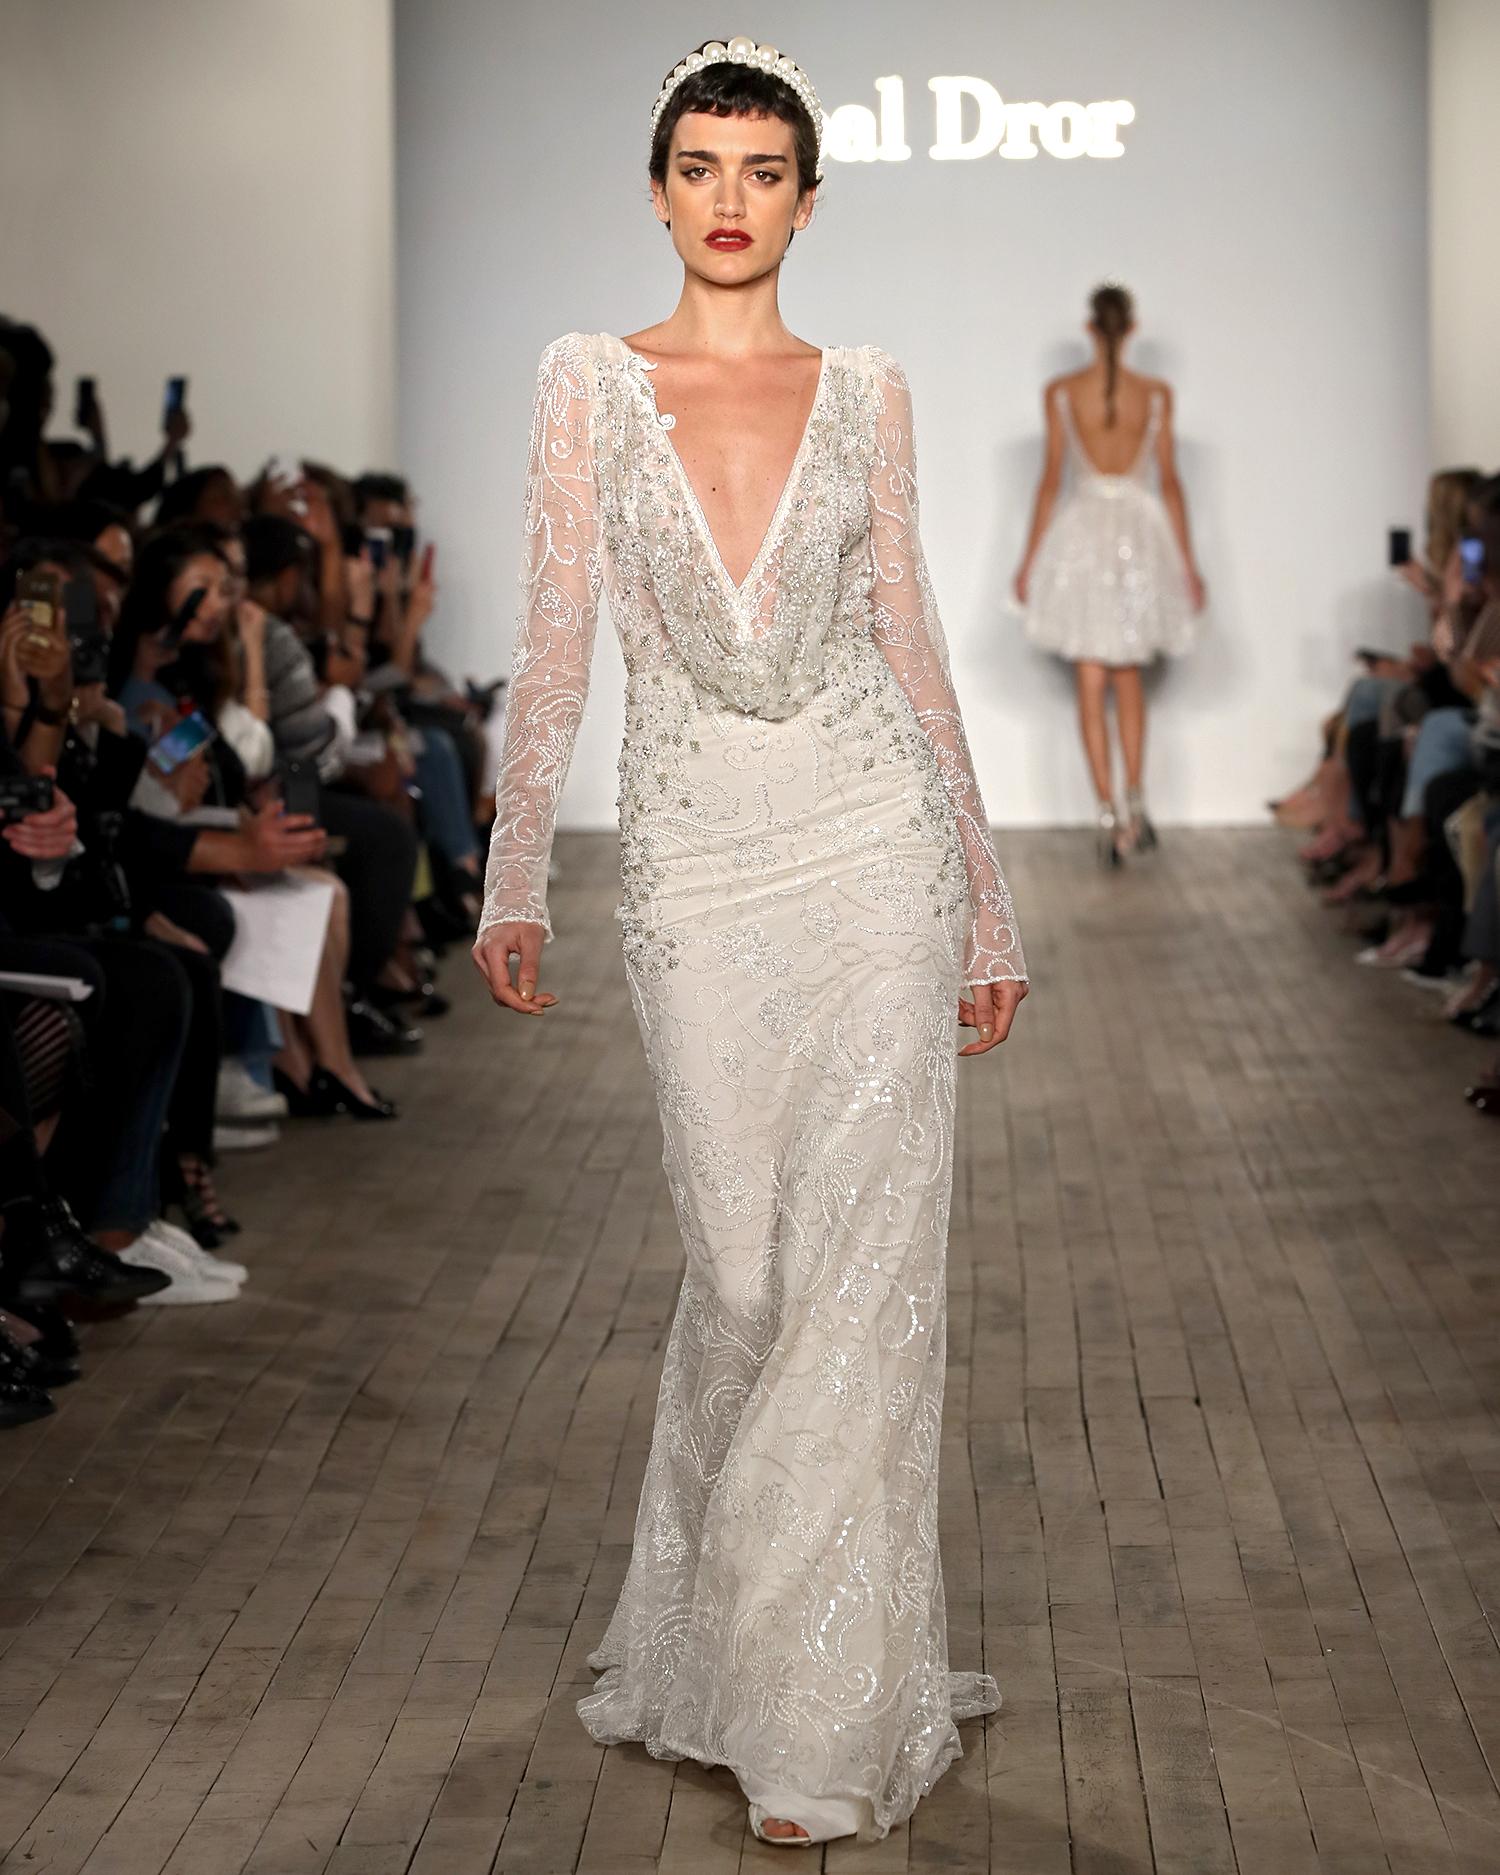 inbal dror wedding dress long-sleeved sheath with draped neck